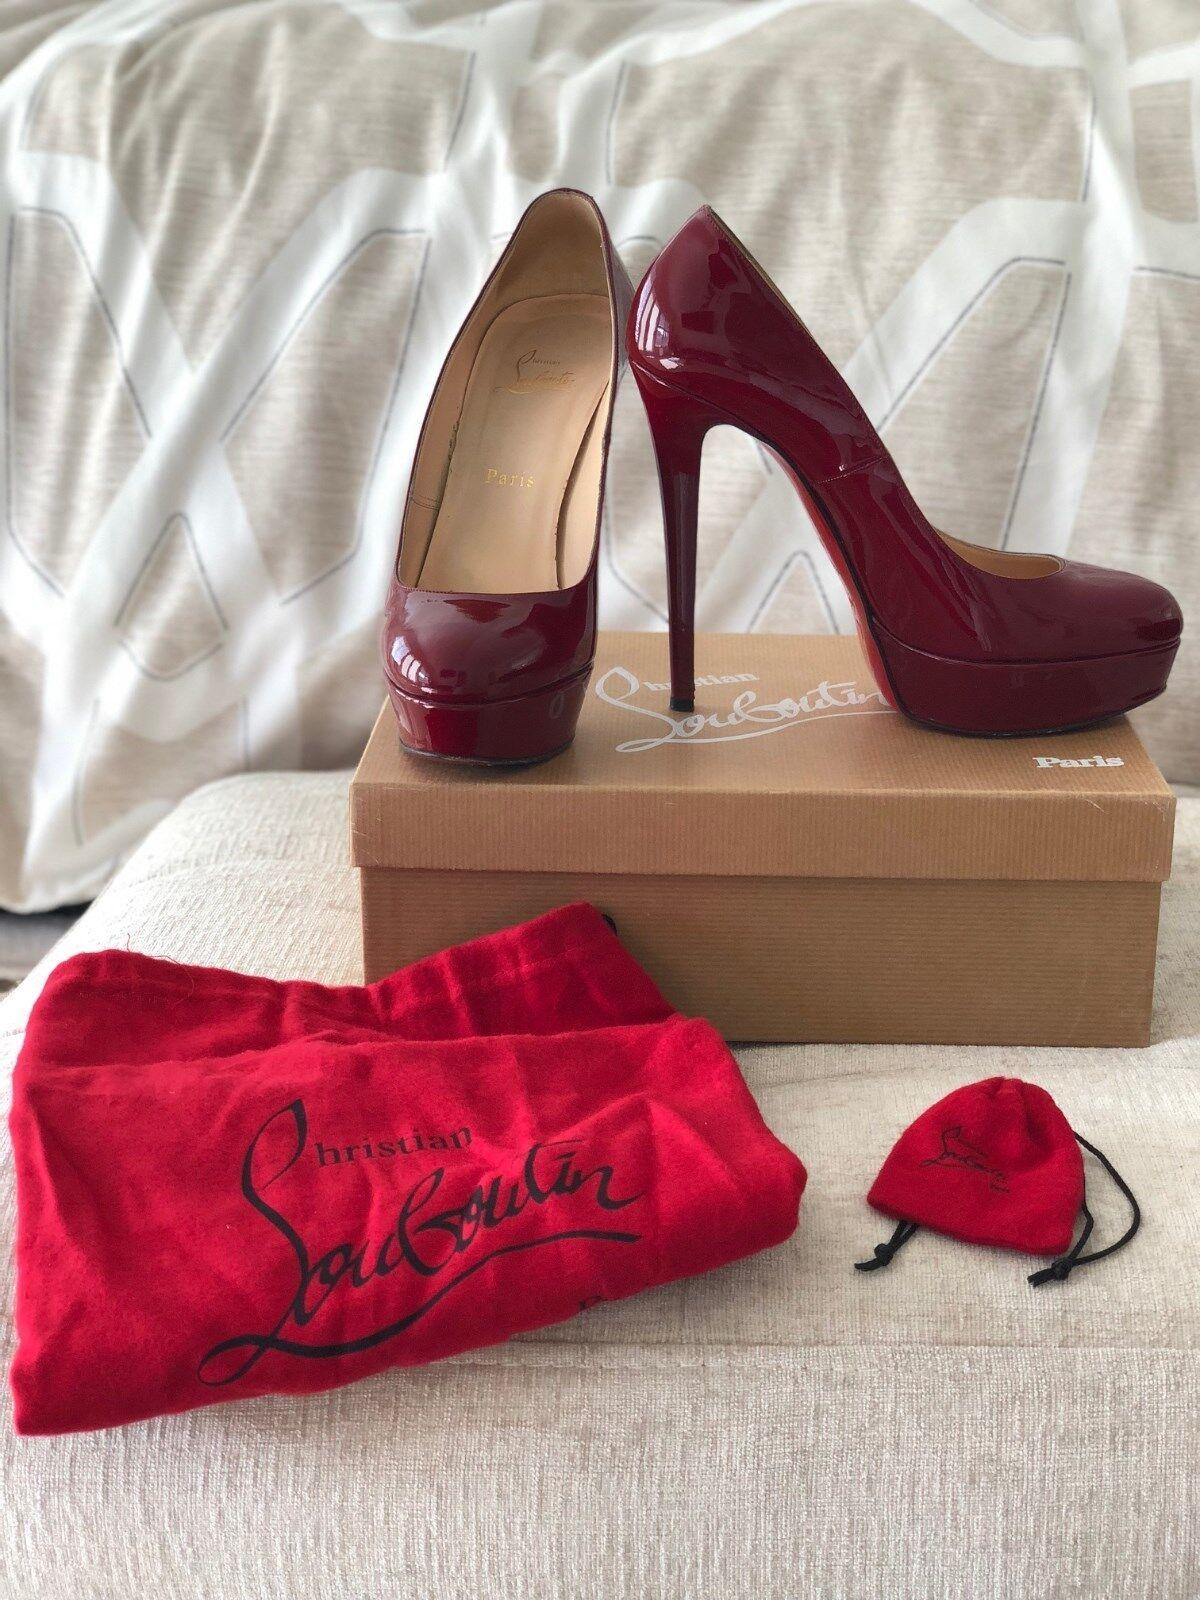 Christian Louboutin white 140 140 140 Patent Calf RED Size 39 217070